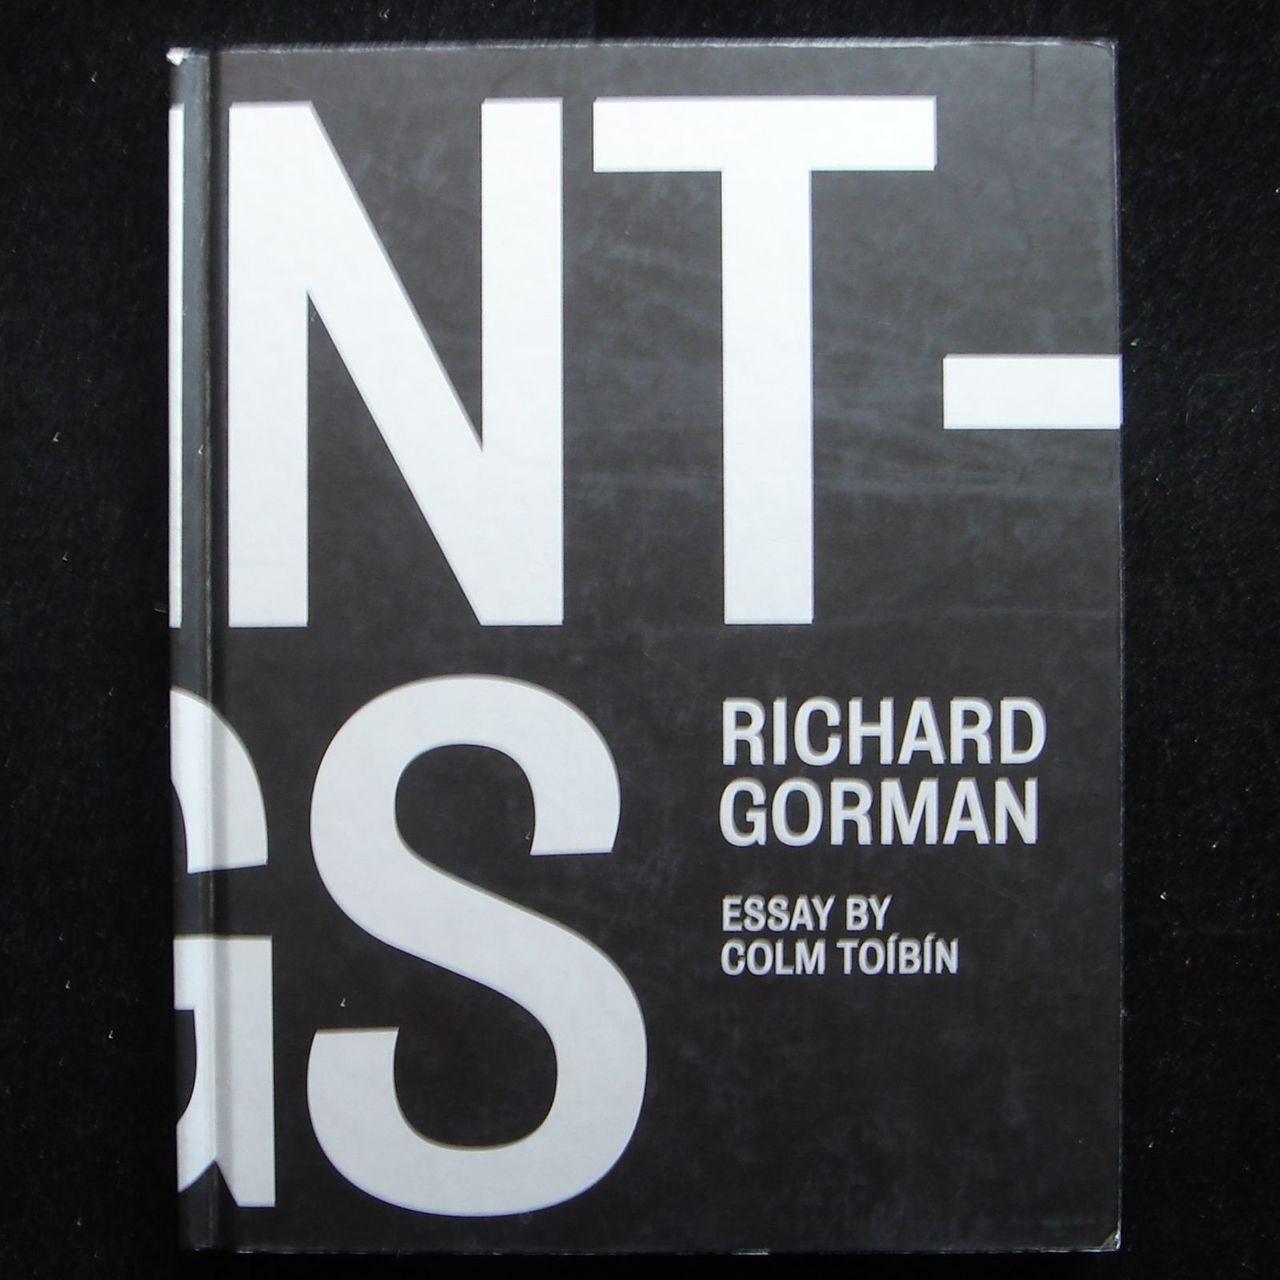 PAINTINGS: RICHARD GORMAN Exhibition Catalog 2005 Modern Art Minimalist Scarce